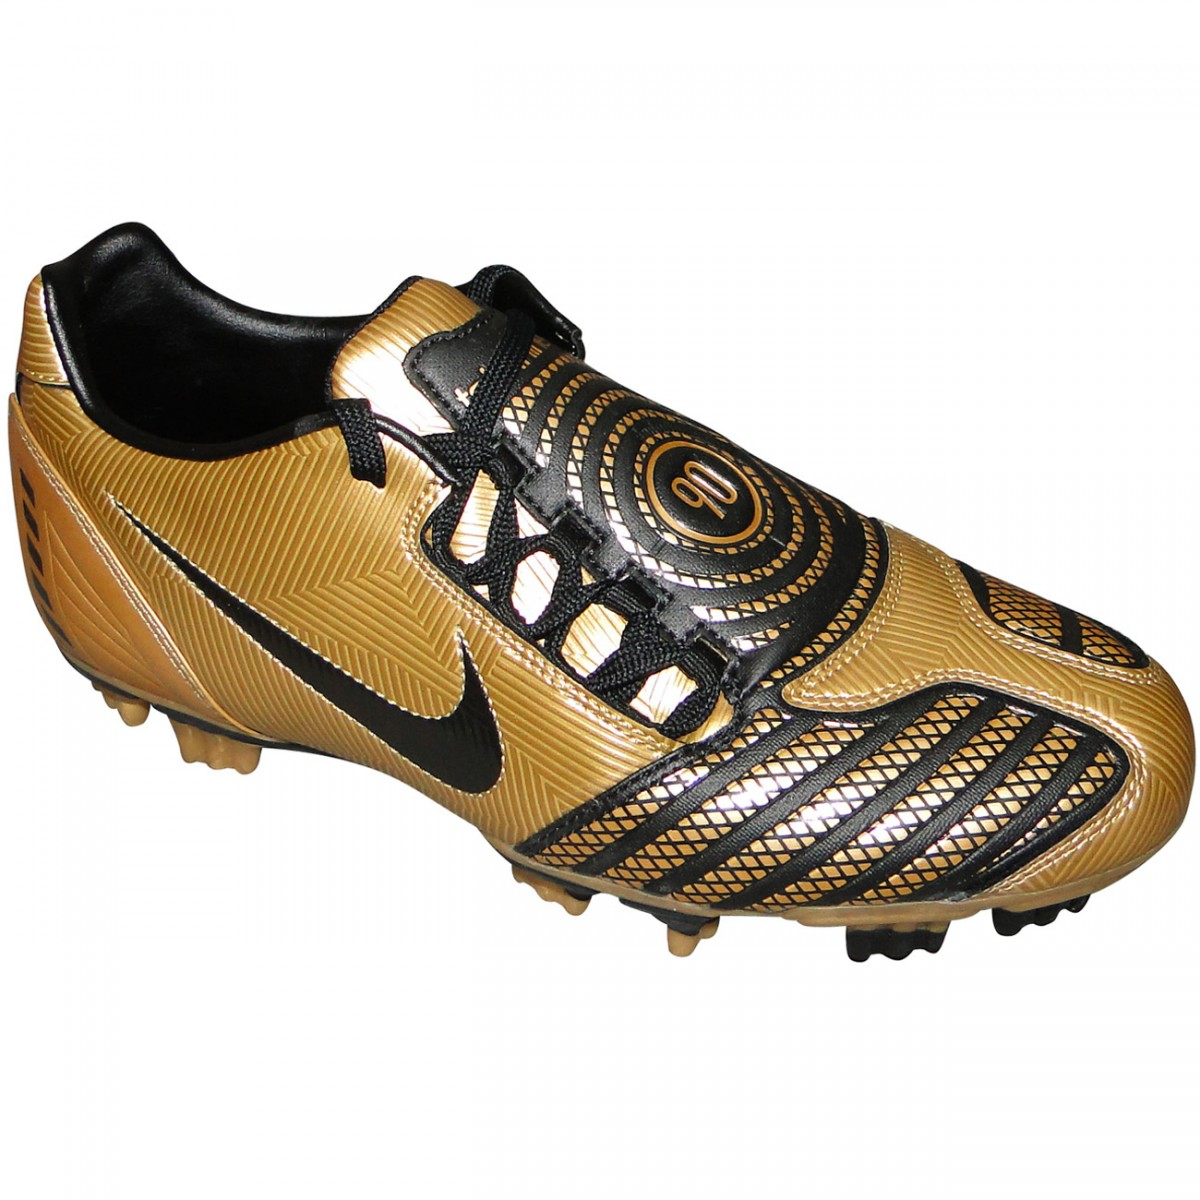 ae7dd97283c62 Chuteira Nike T90 Shoot 6017 - DOURADO/PRETO - Chuteira Nike, Adidas ...